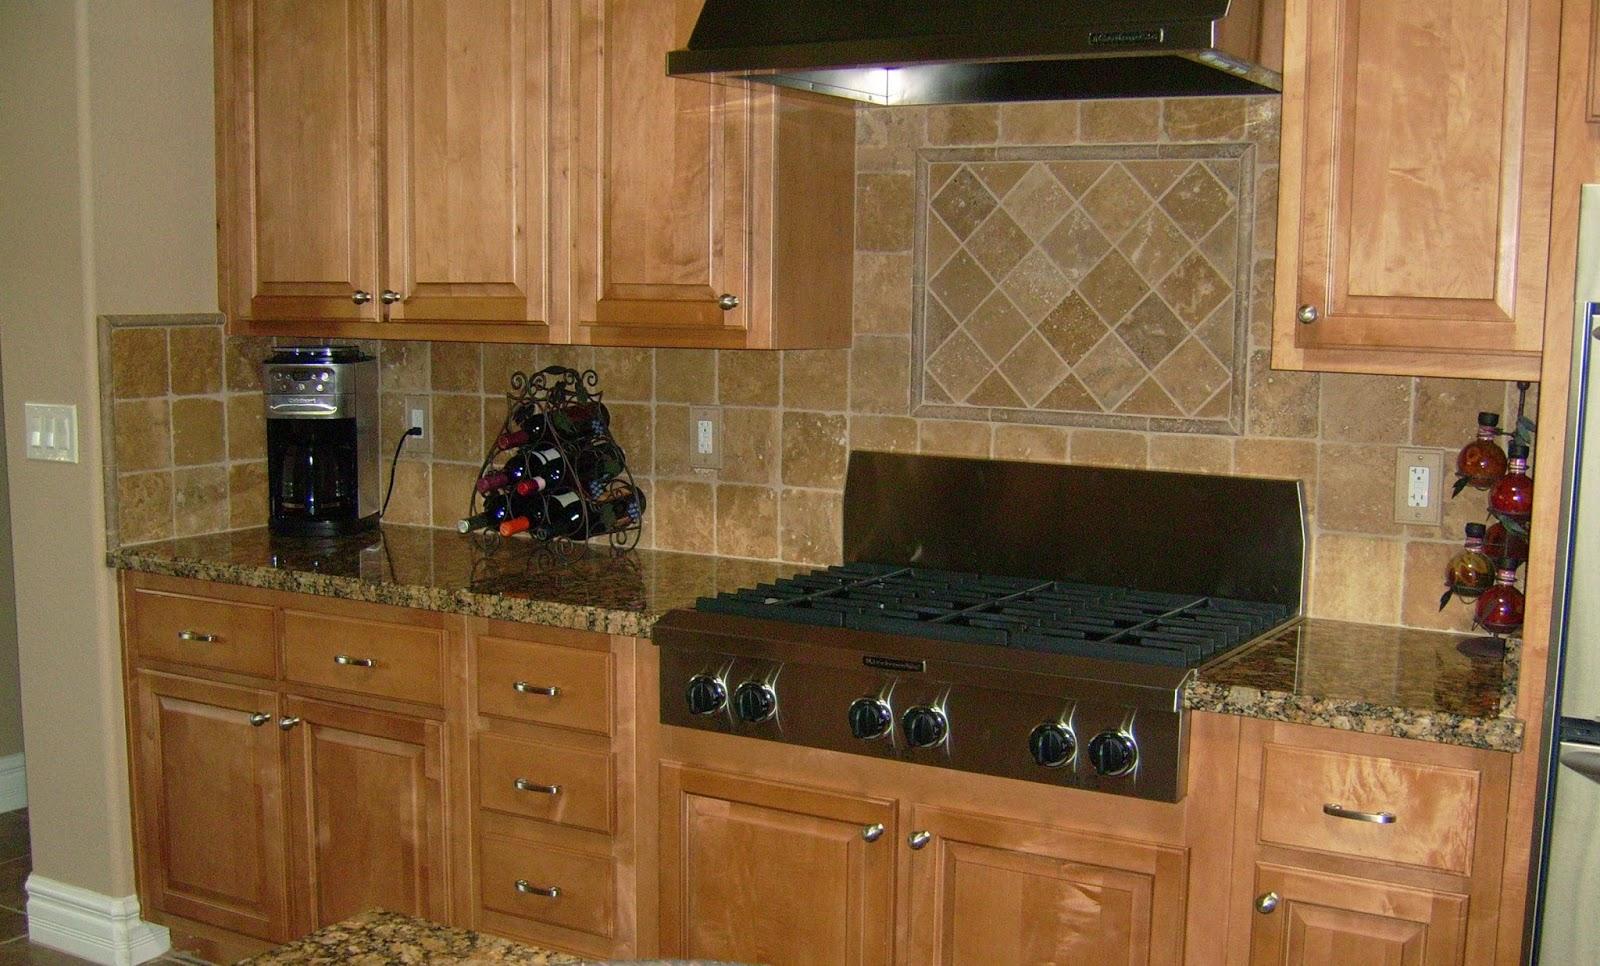 Simple Kitchen Backsplash Ideas Pictures easy kitchen backsplash - home design ideas and pictures